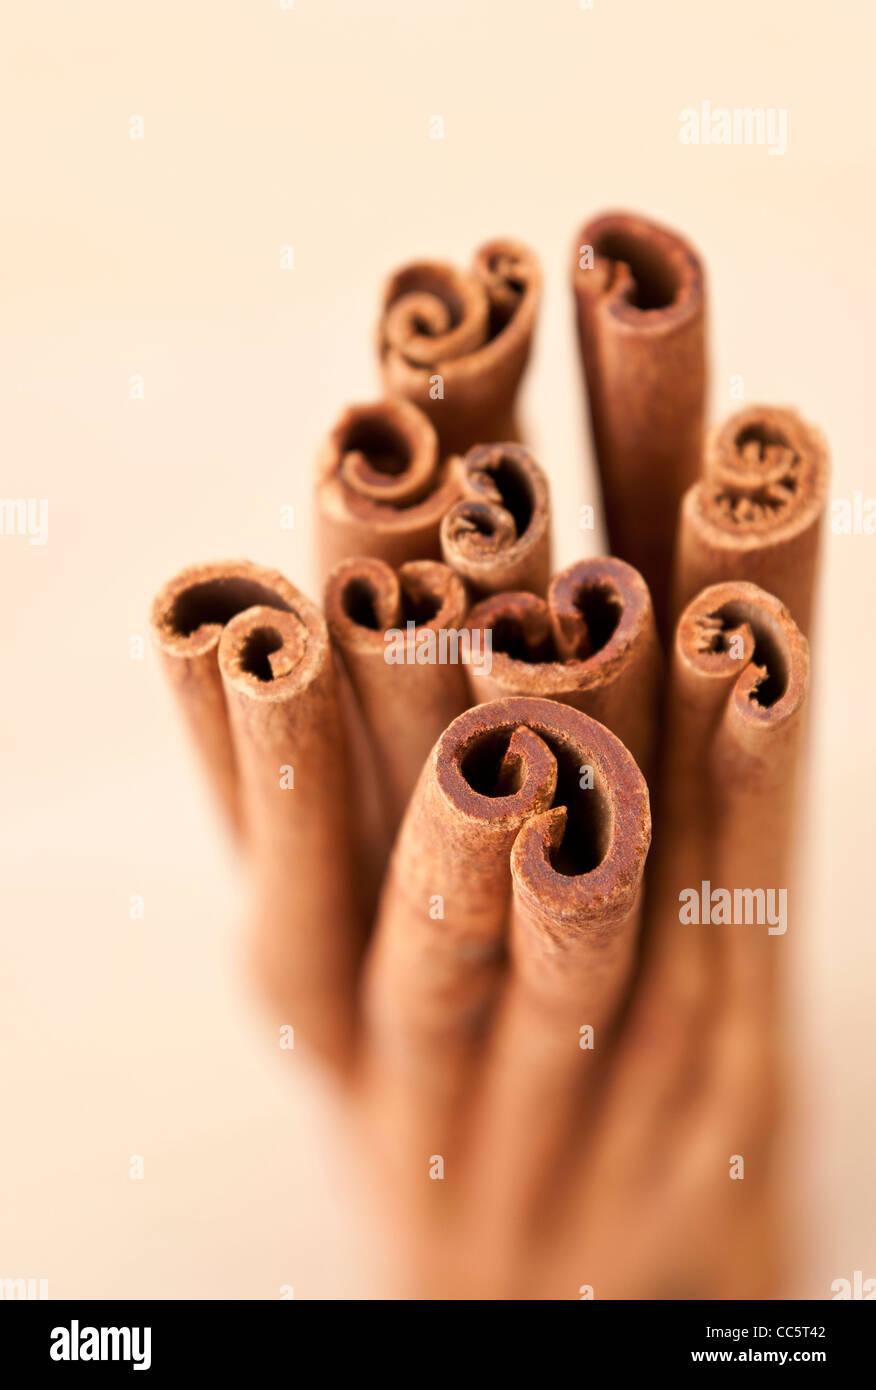 Bunch of Cinnamon sticks. Narrow DoF - Stock Image